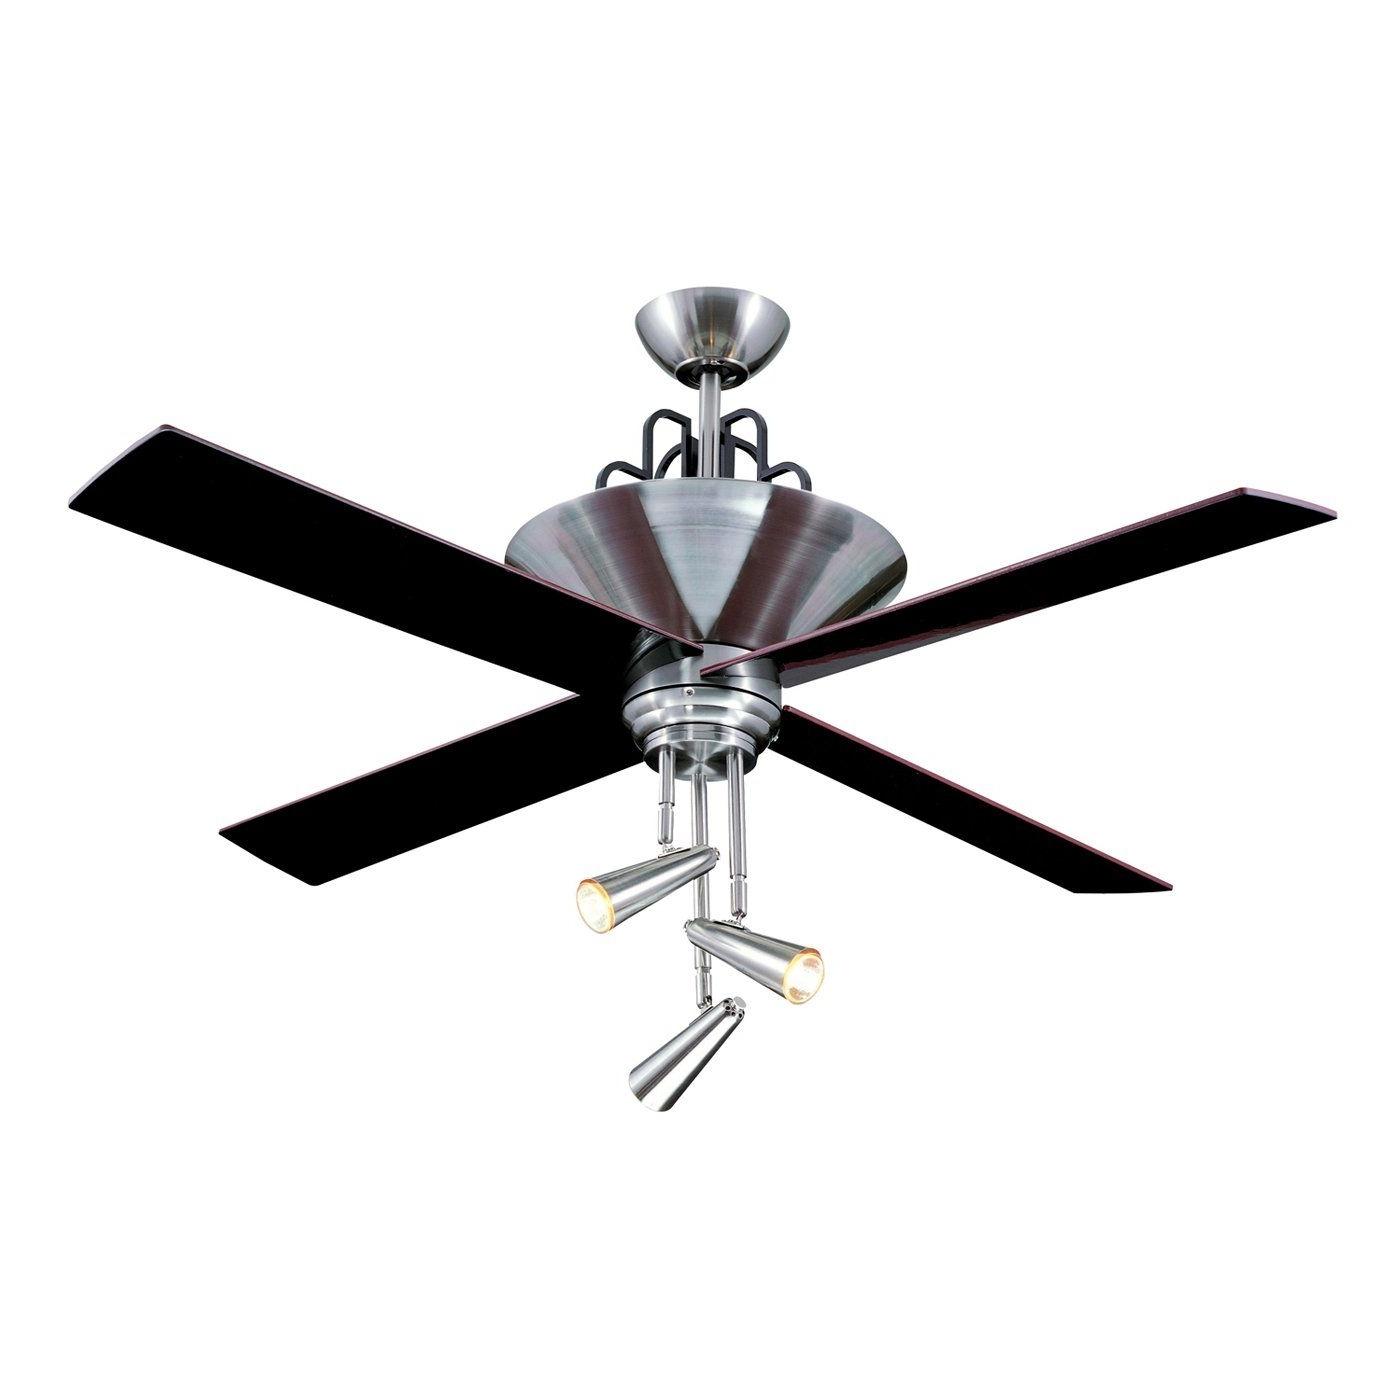 Preferred Ellington Fans E Gal52Bc4Gr 3 Light Galileo Ceiling Fan, Black Regarding Ellington Outdoor Ceiling Fans (View 17 of 20)